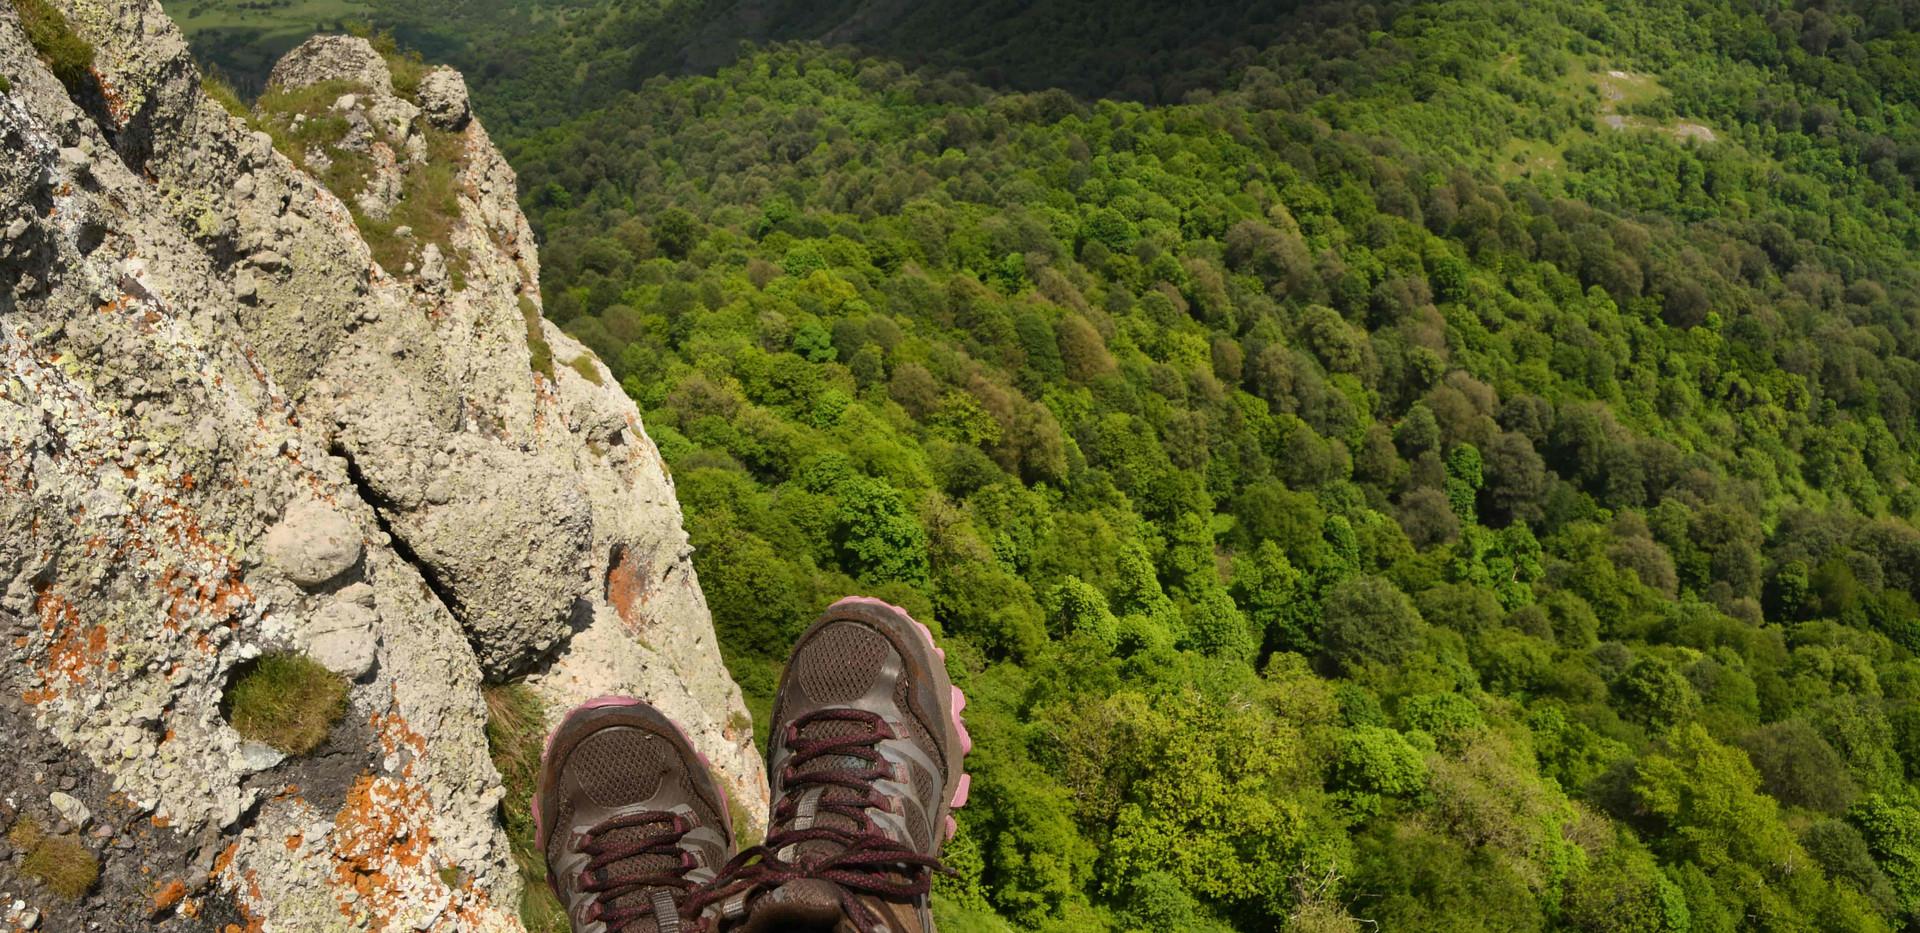 view from the Kachaghakaberd mountain